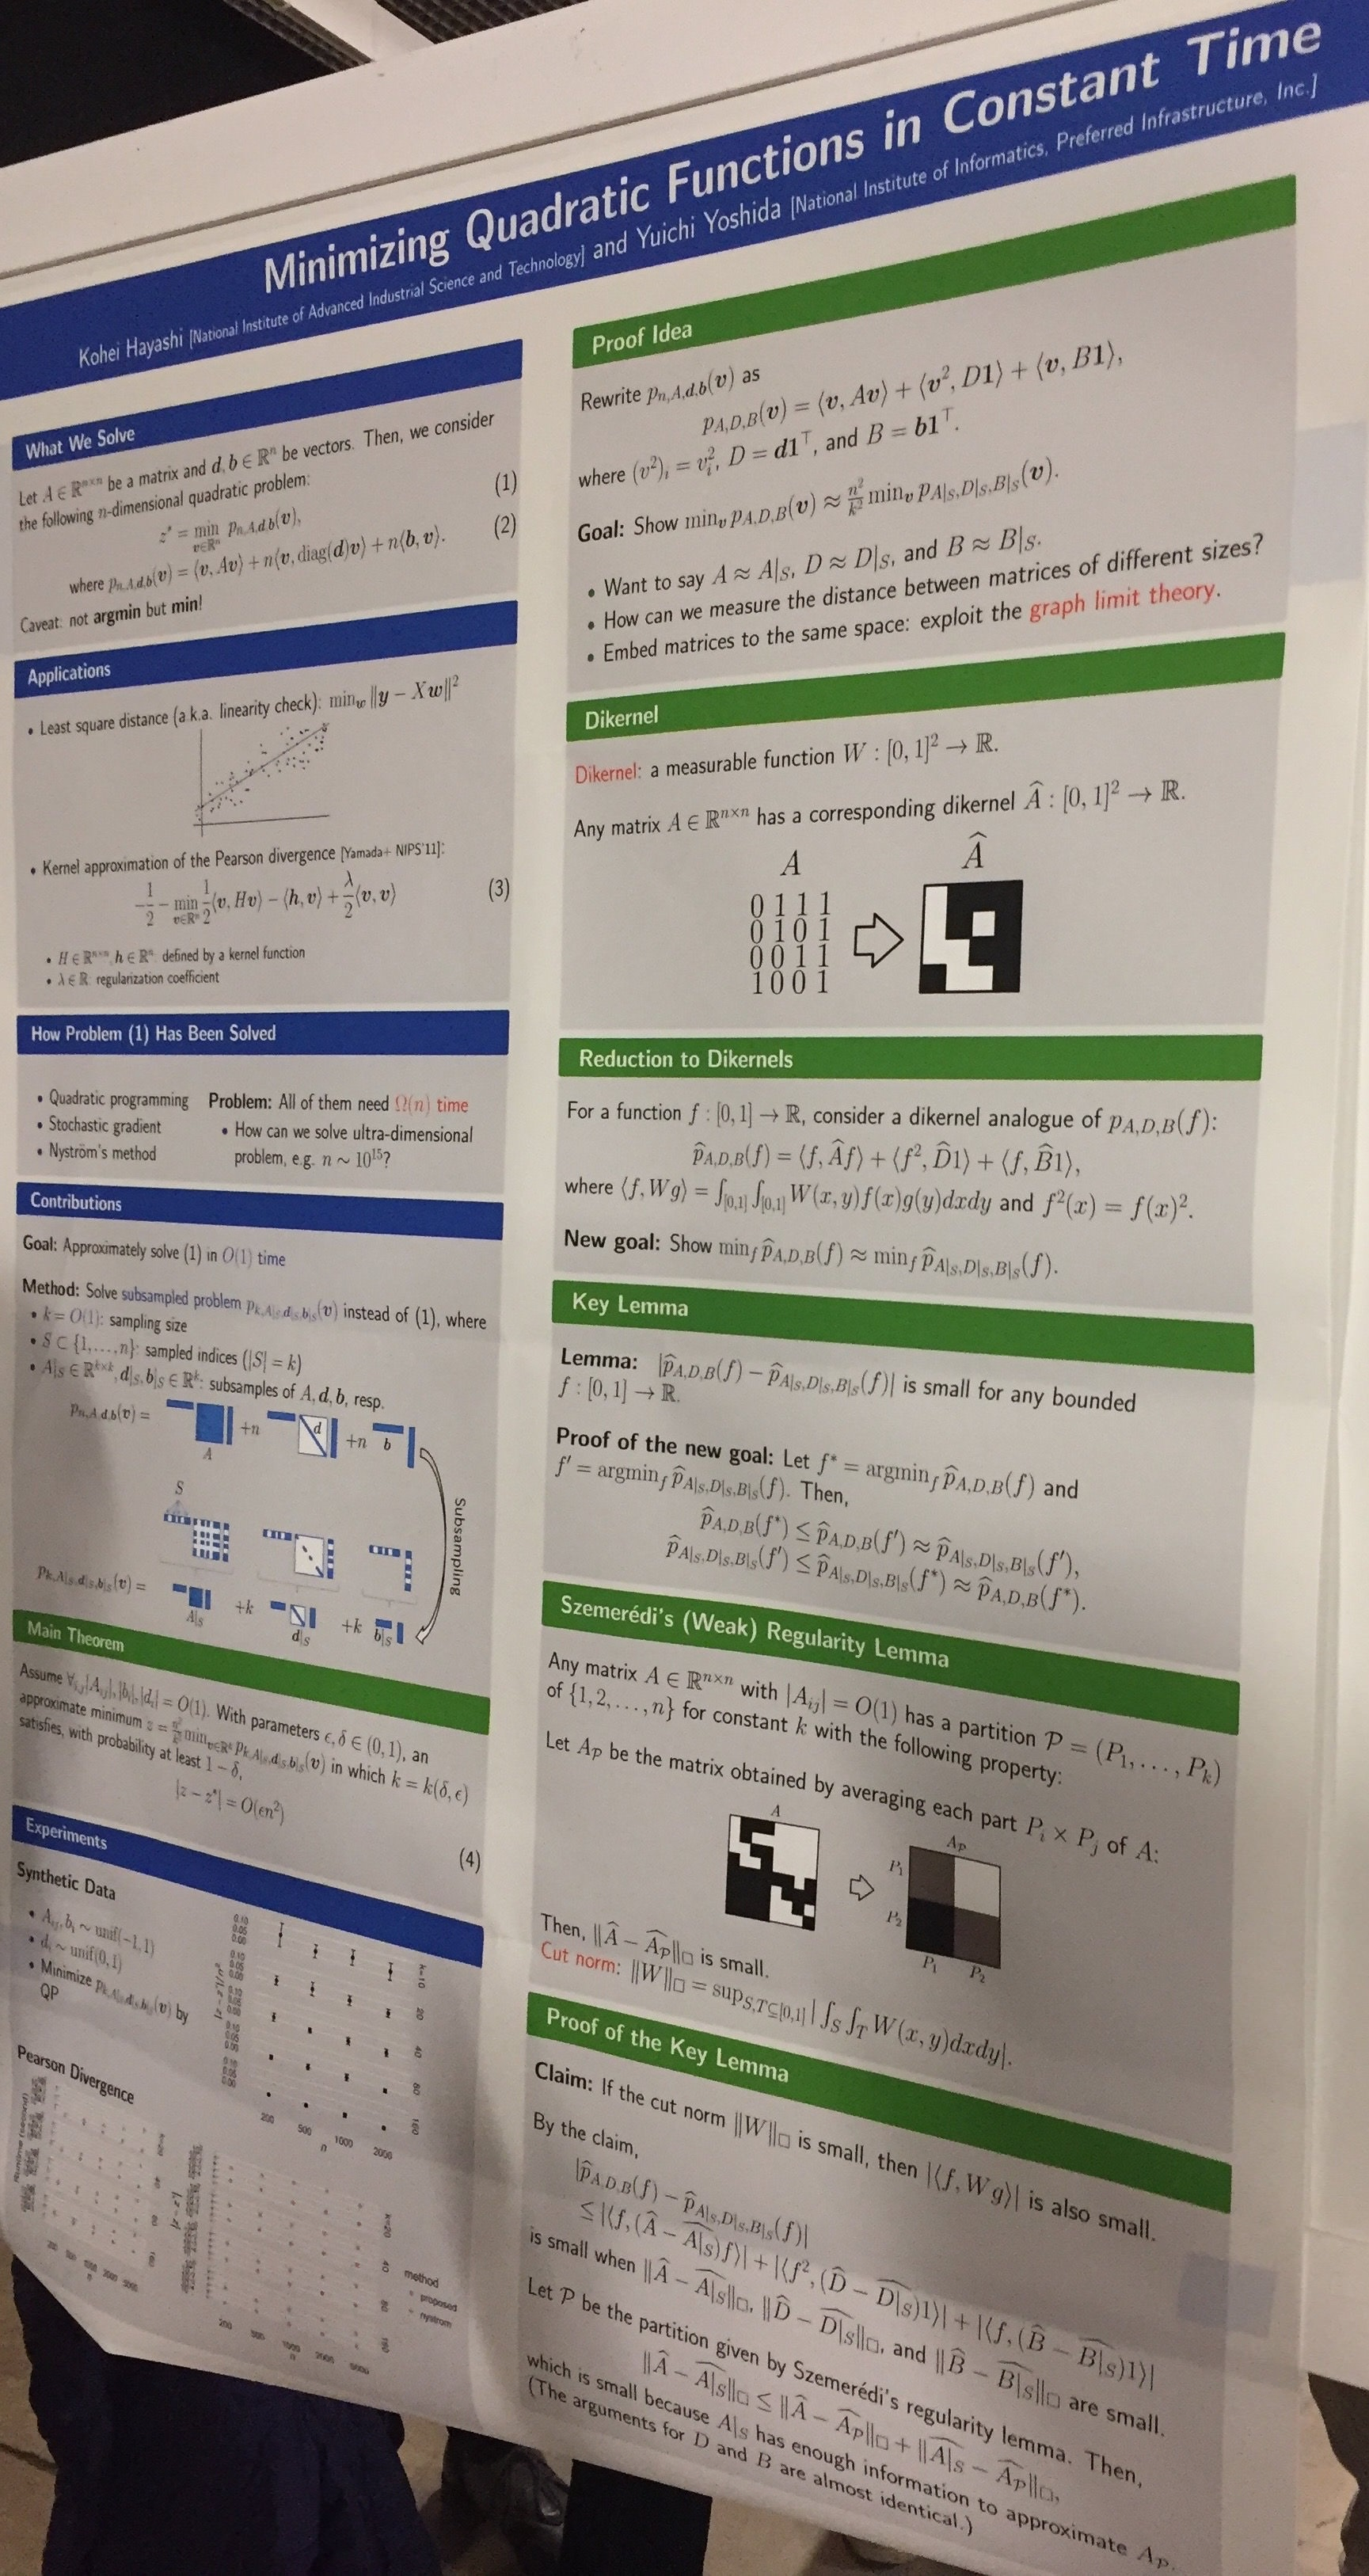 Hayashi_Minimizing_Quadratic_Functions_in_Constant_Time.jpg